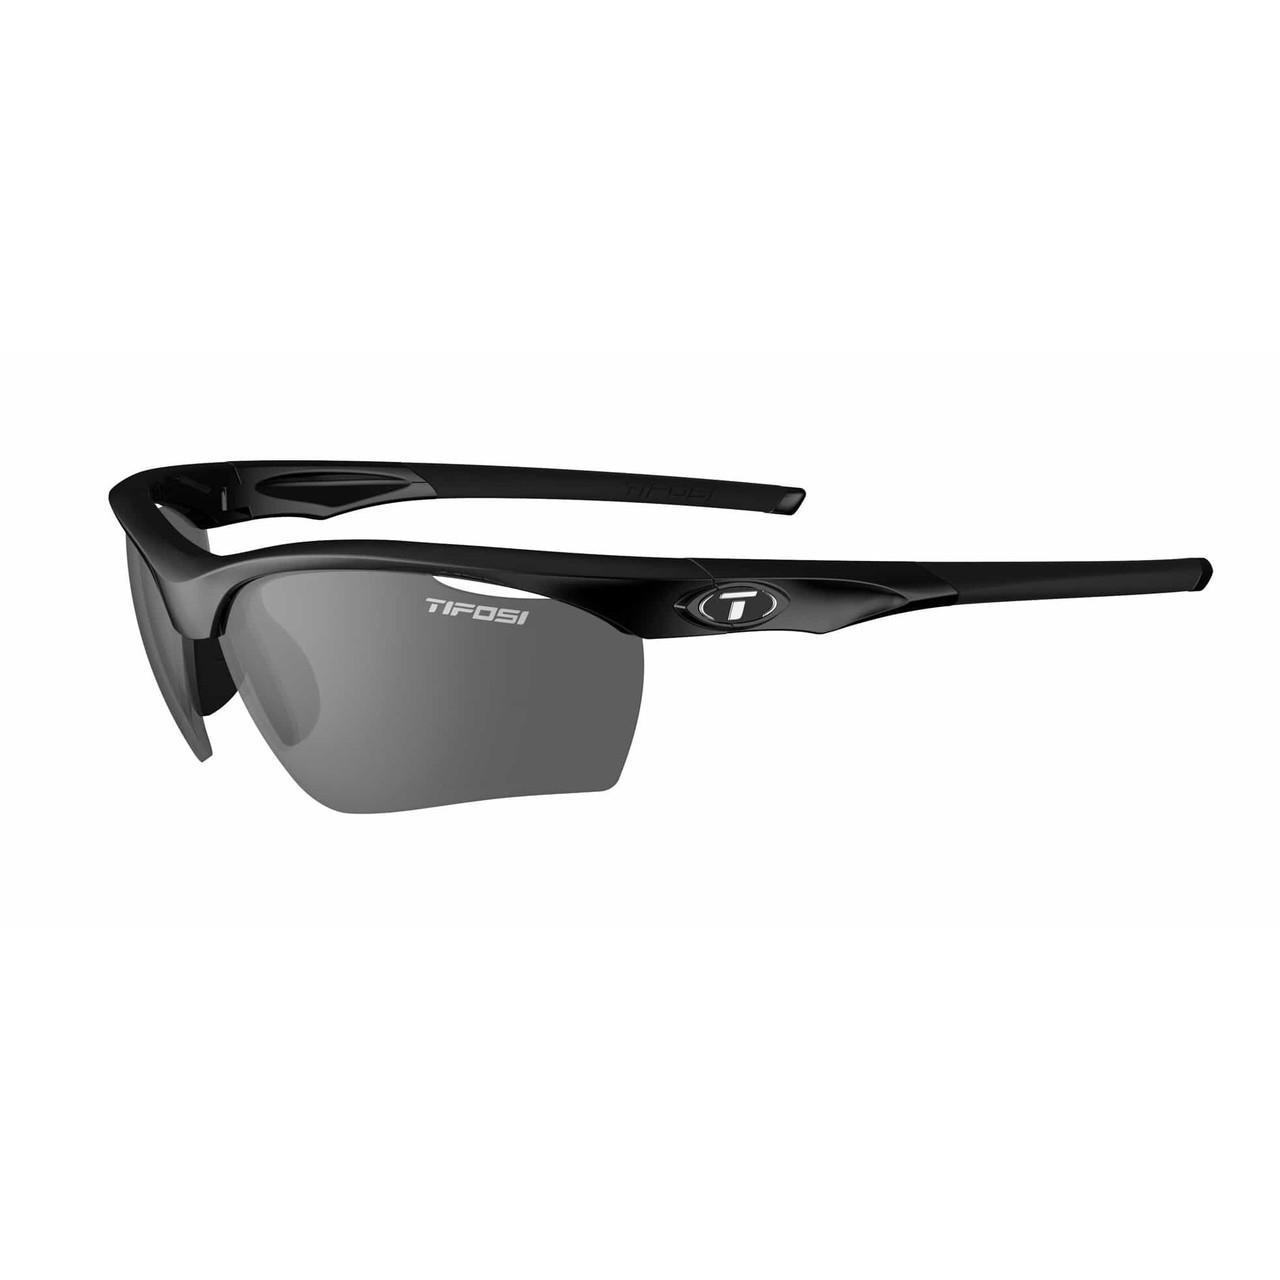 Tifosi Vero Interchangeable Sunglasses - 2019 price